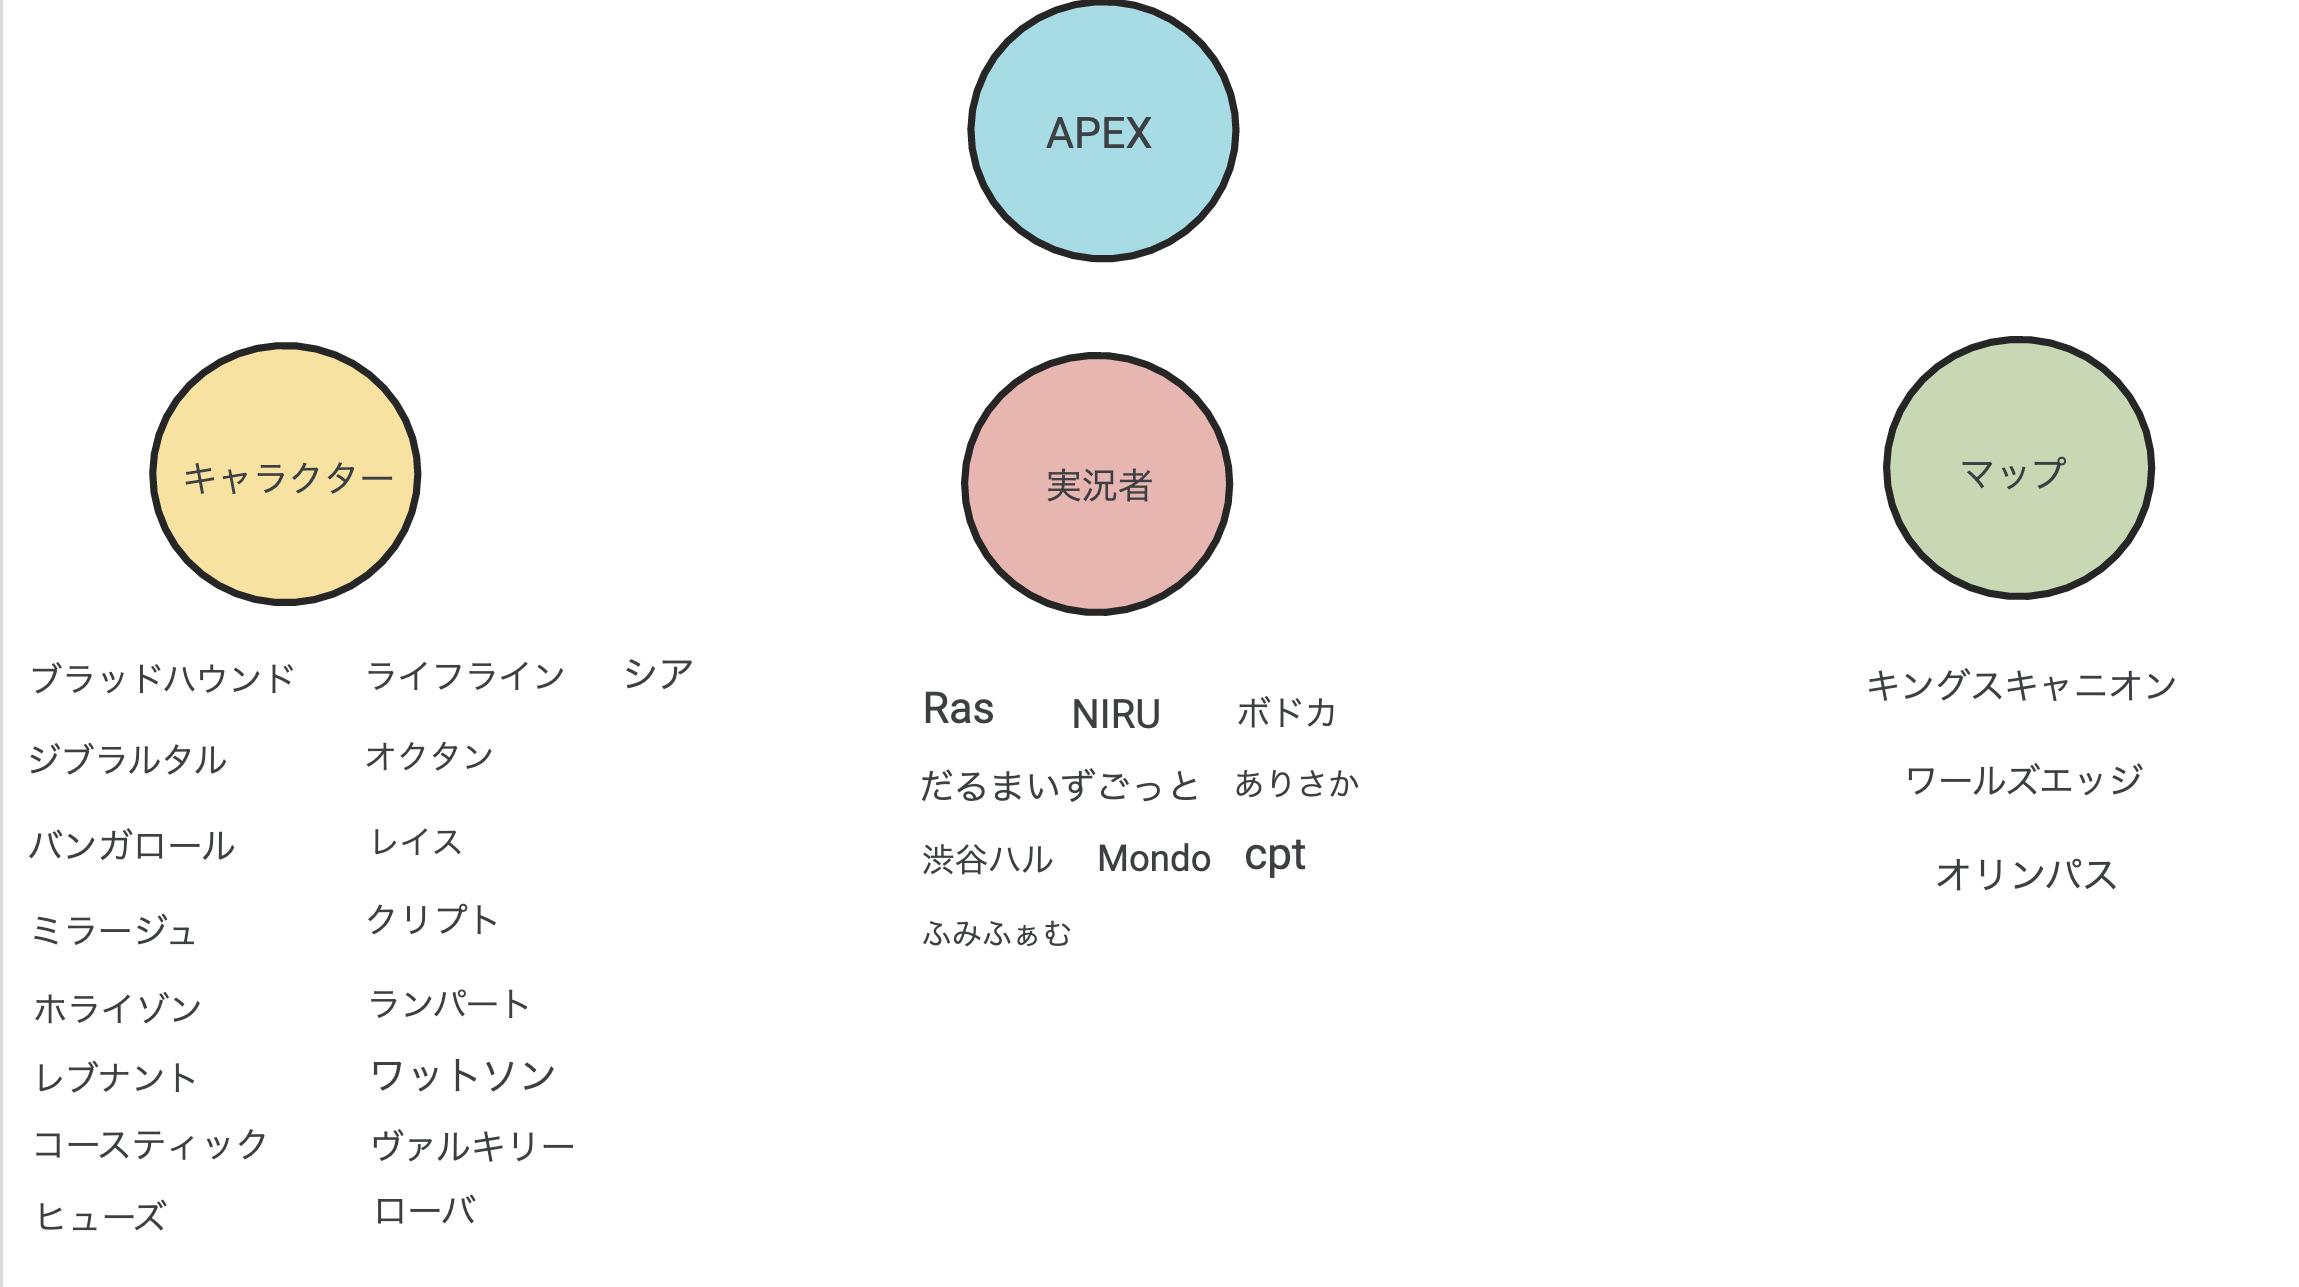 7E786089-5C2A-4BBE-B916-9BB9416F1C0C_1_201_a.jpeg